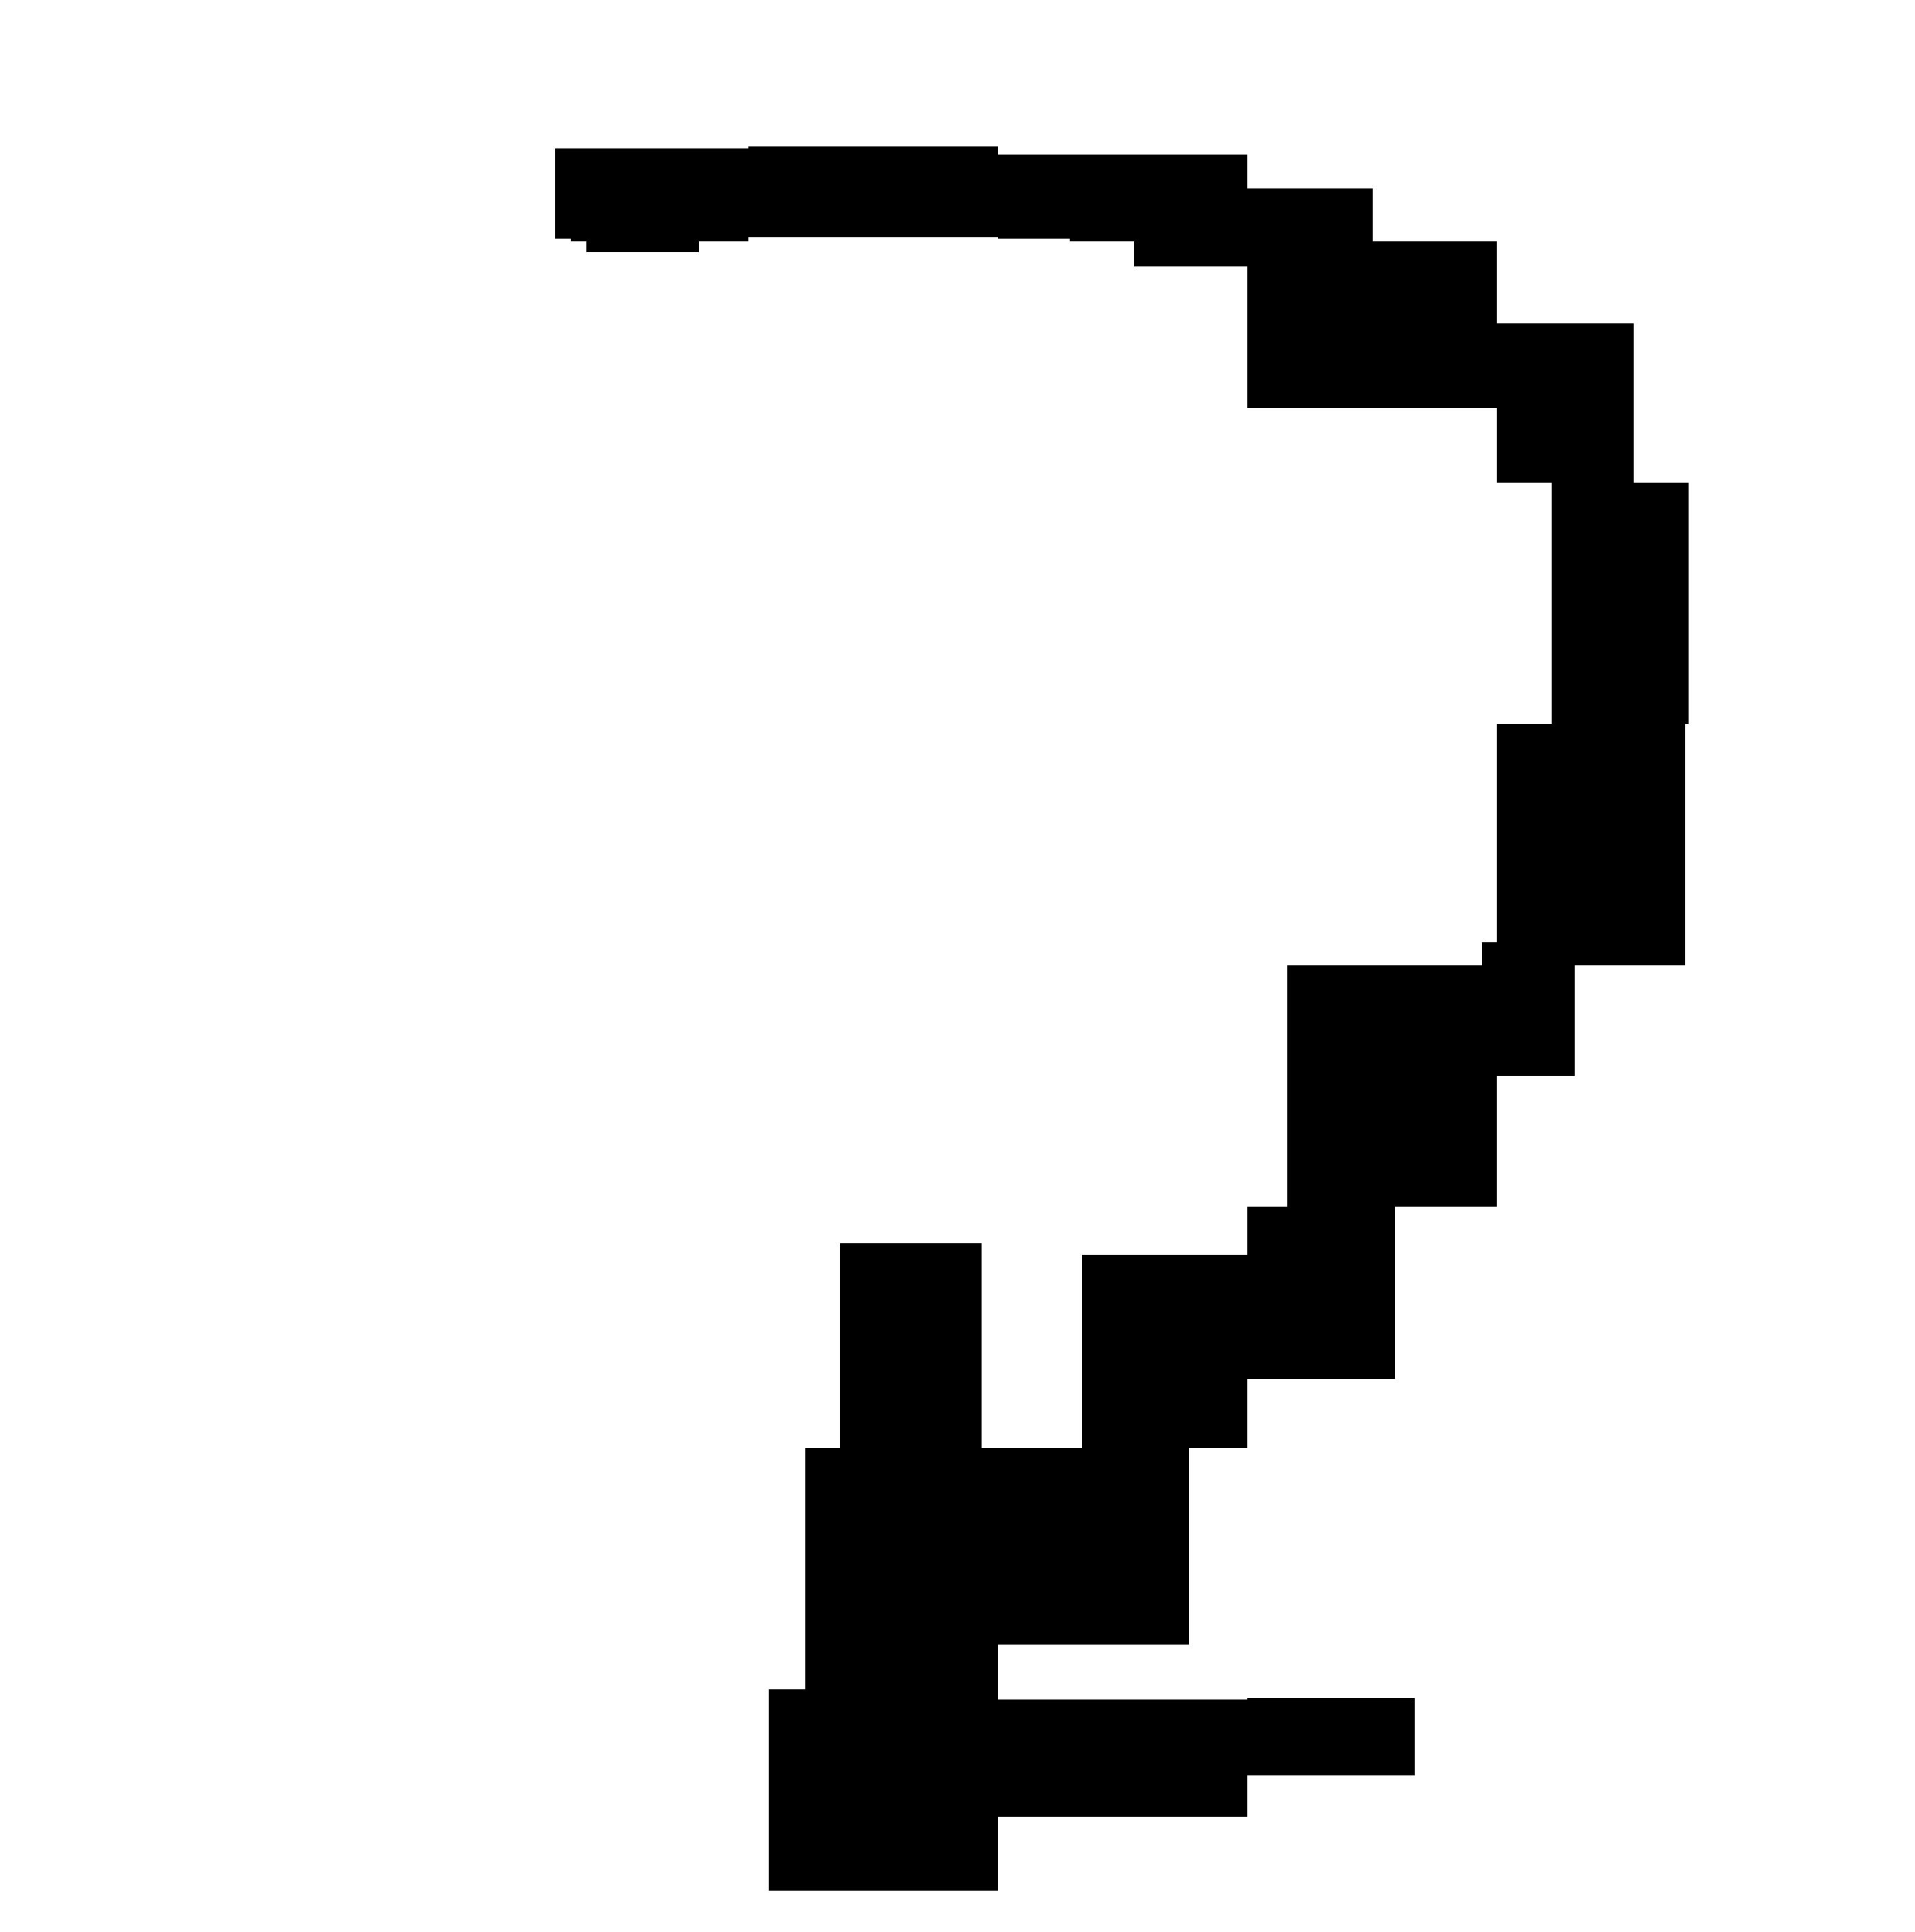 Black and White Arrow Wallpaper - WallpaperSafari | arrows ... graphic black and white stock